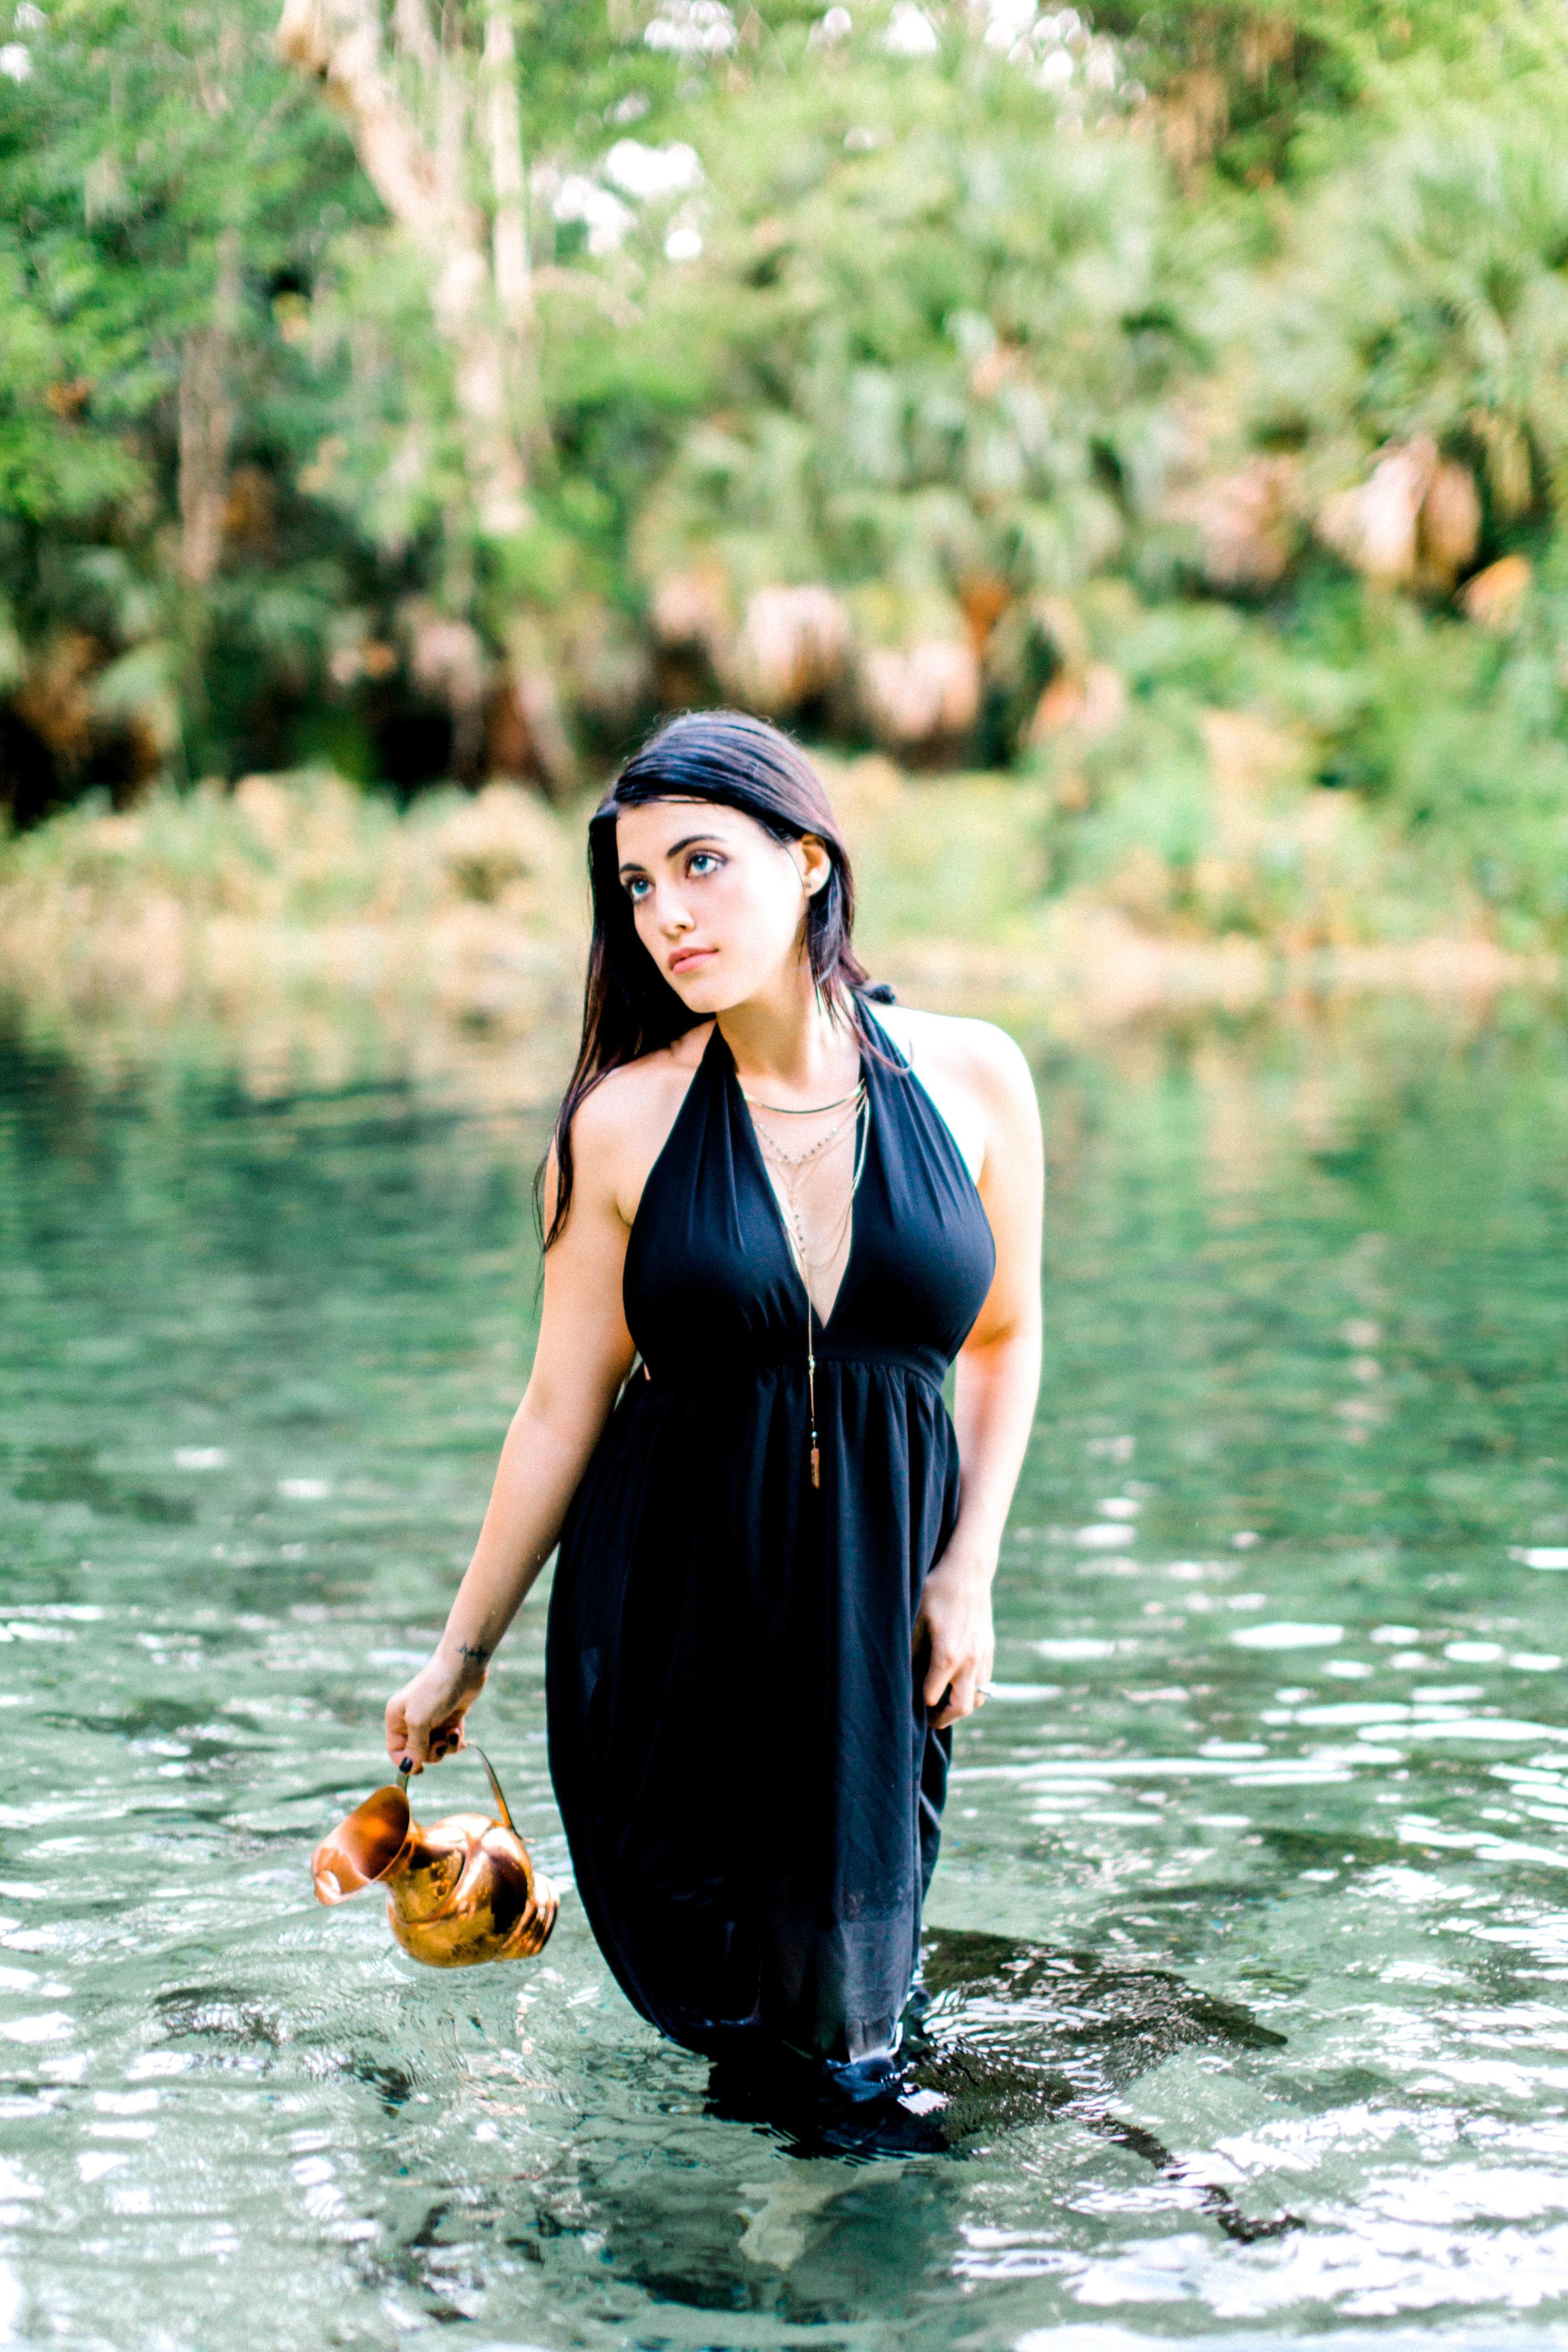 wekiva springs orlando florida model in dress photo